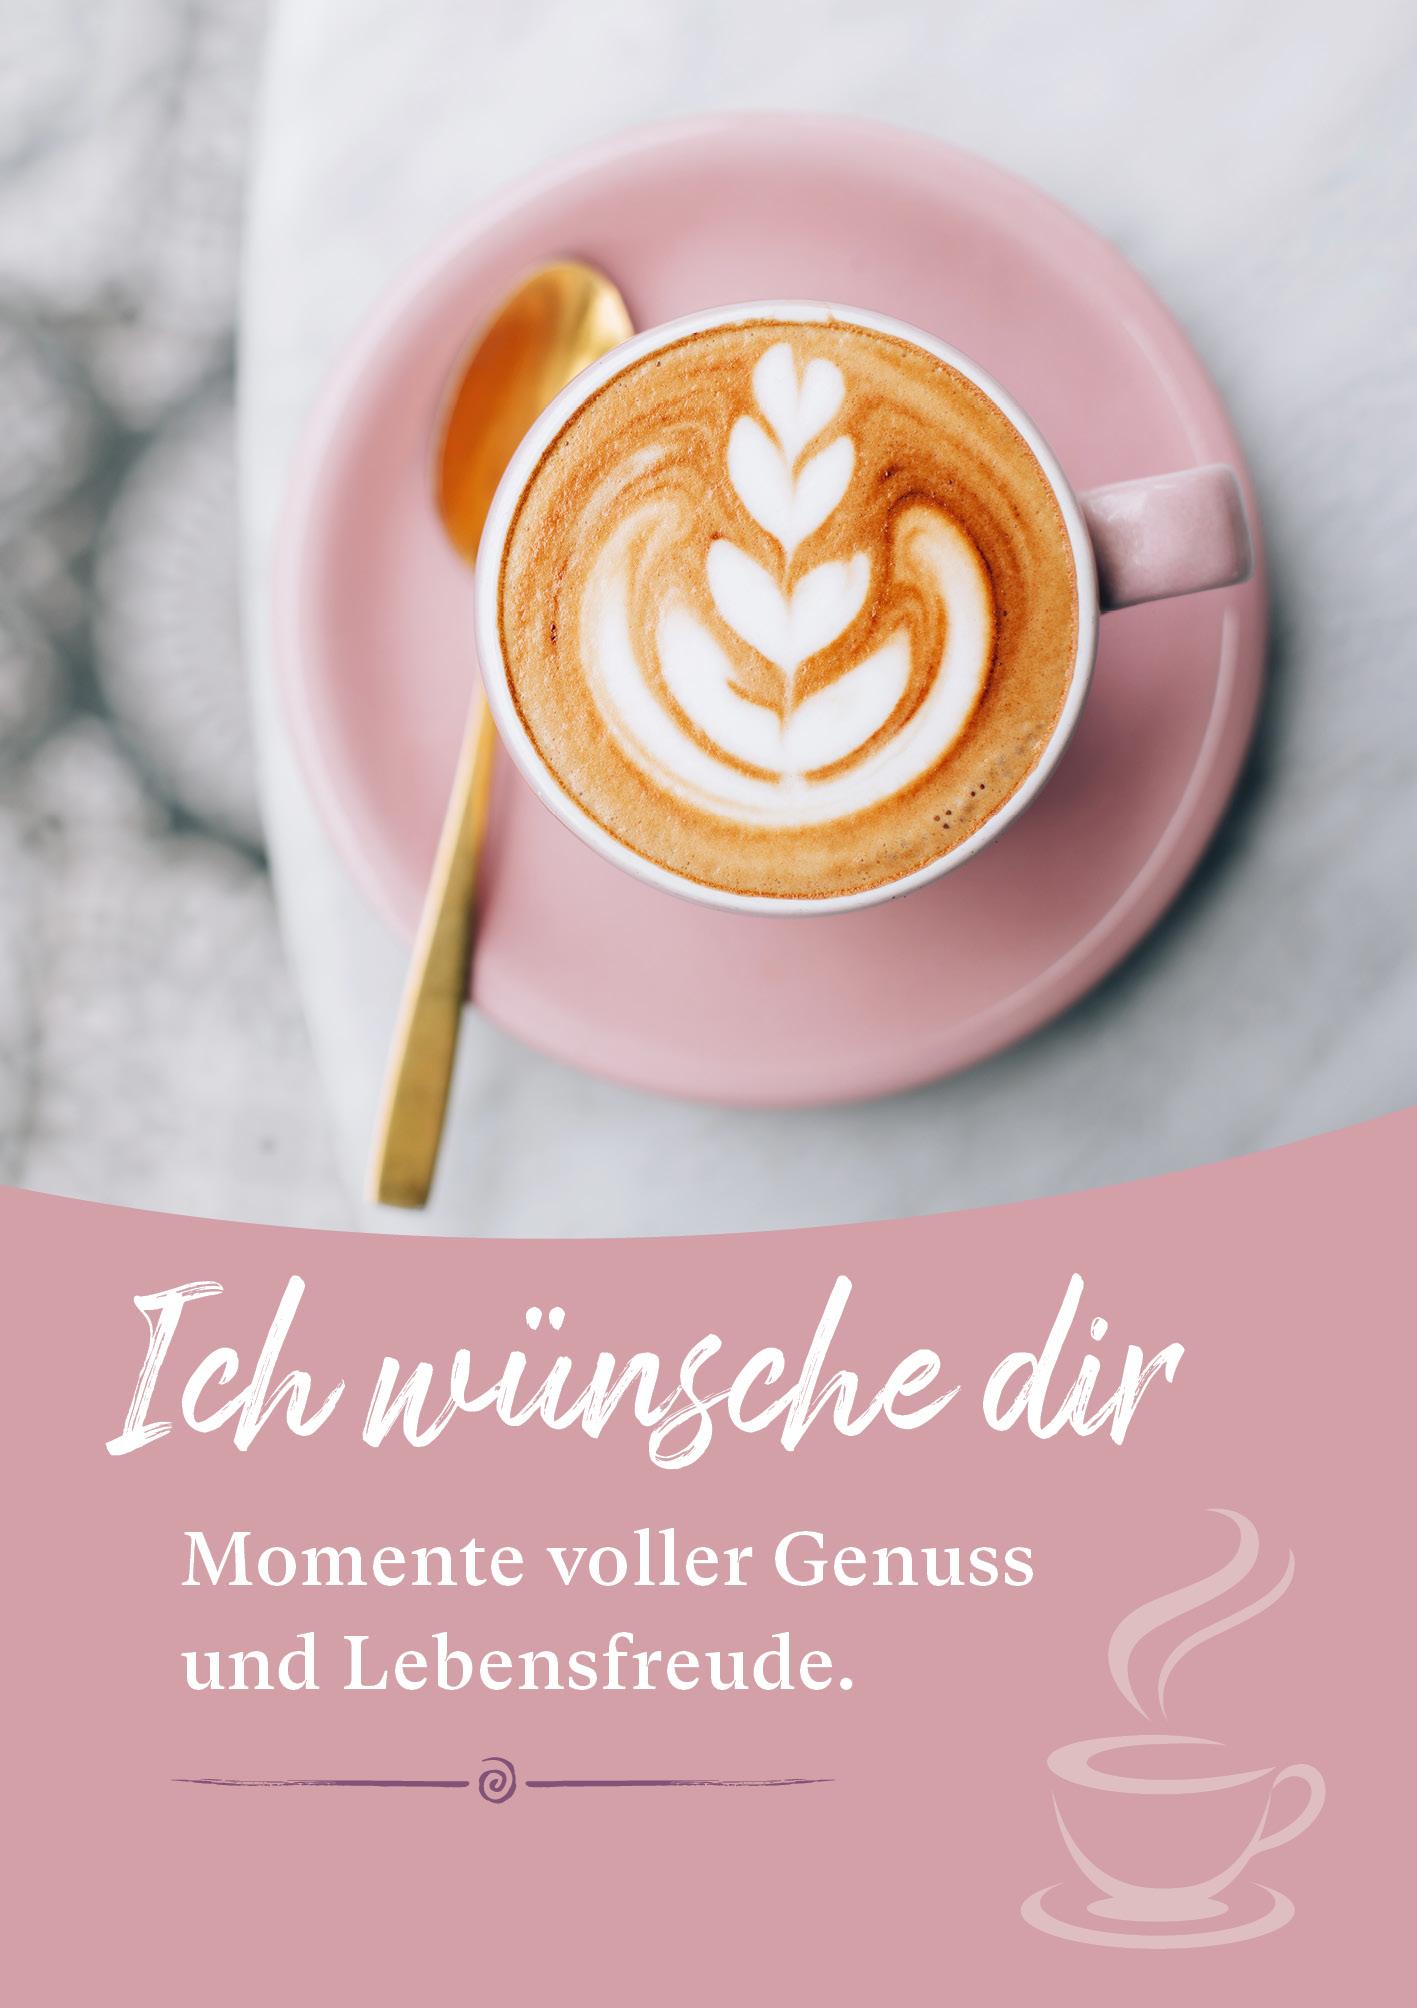 Kunst-Postkarte - Voller Genuss